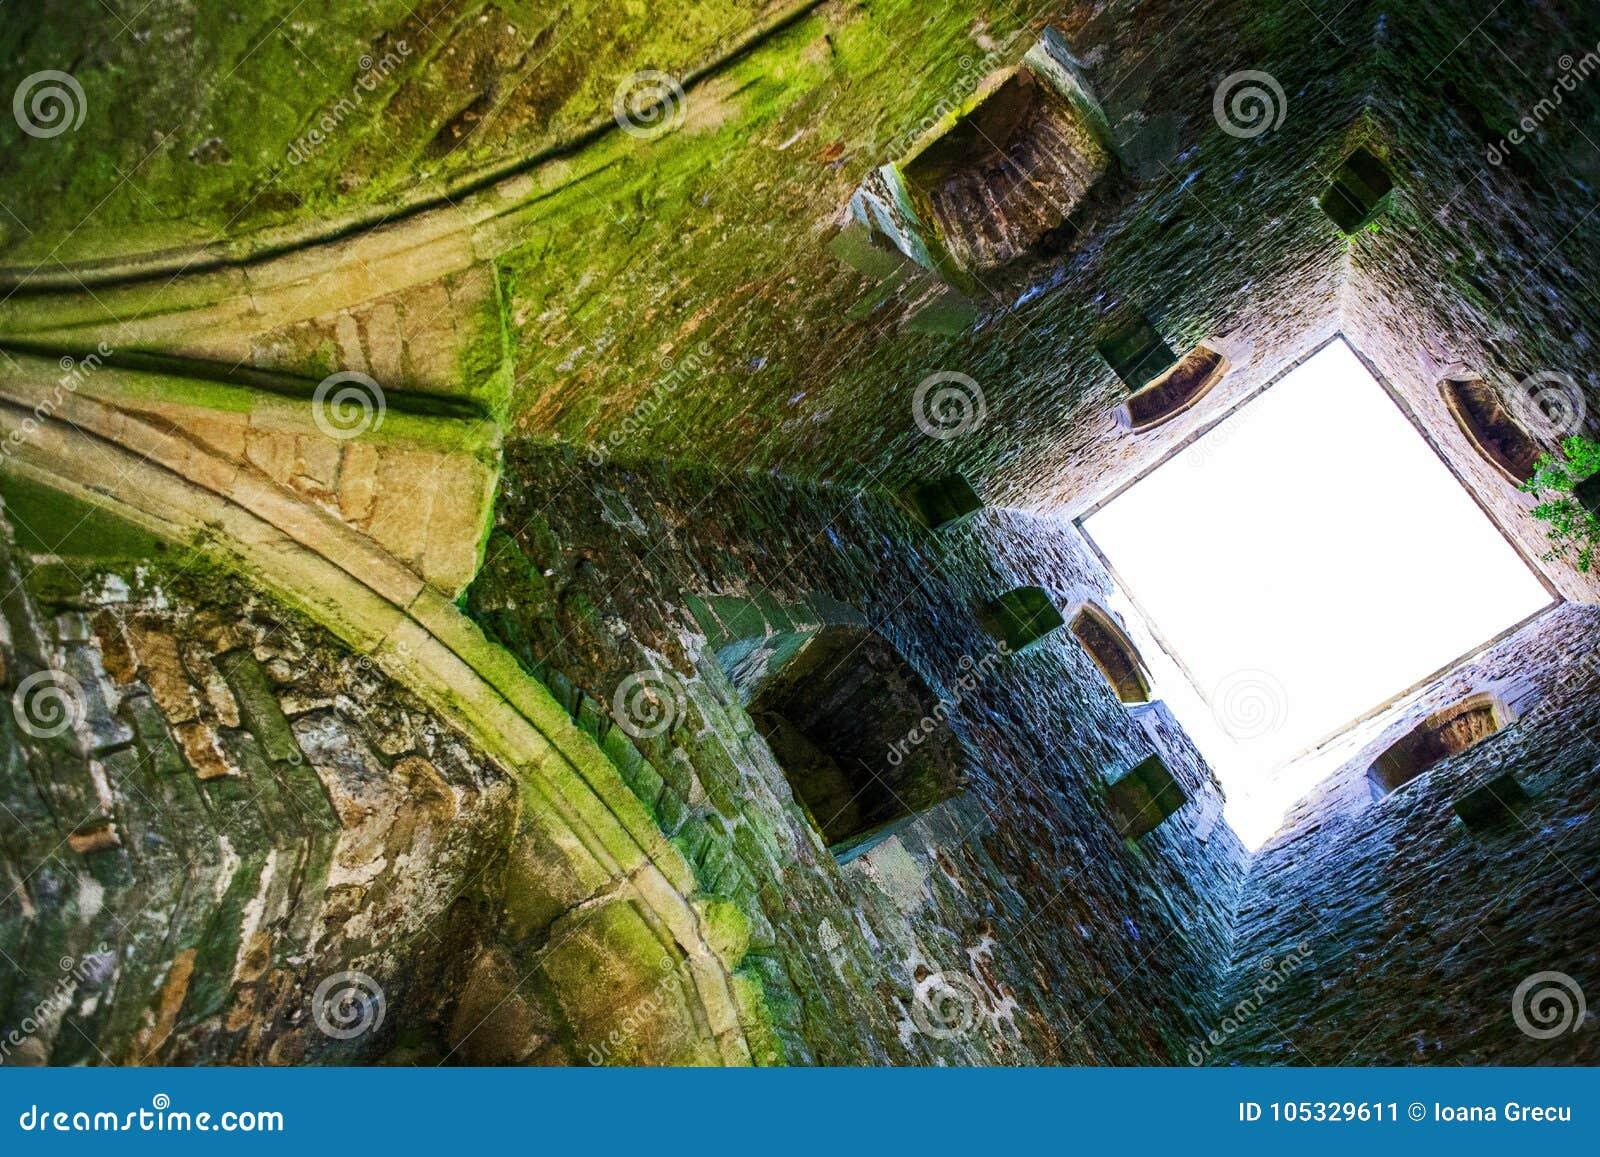 Inside the Glastonbury Tor tower on the Glastonbury Hill